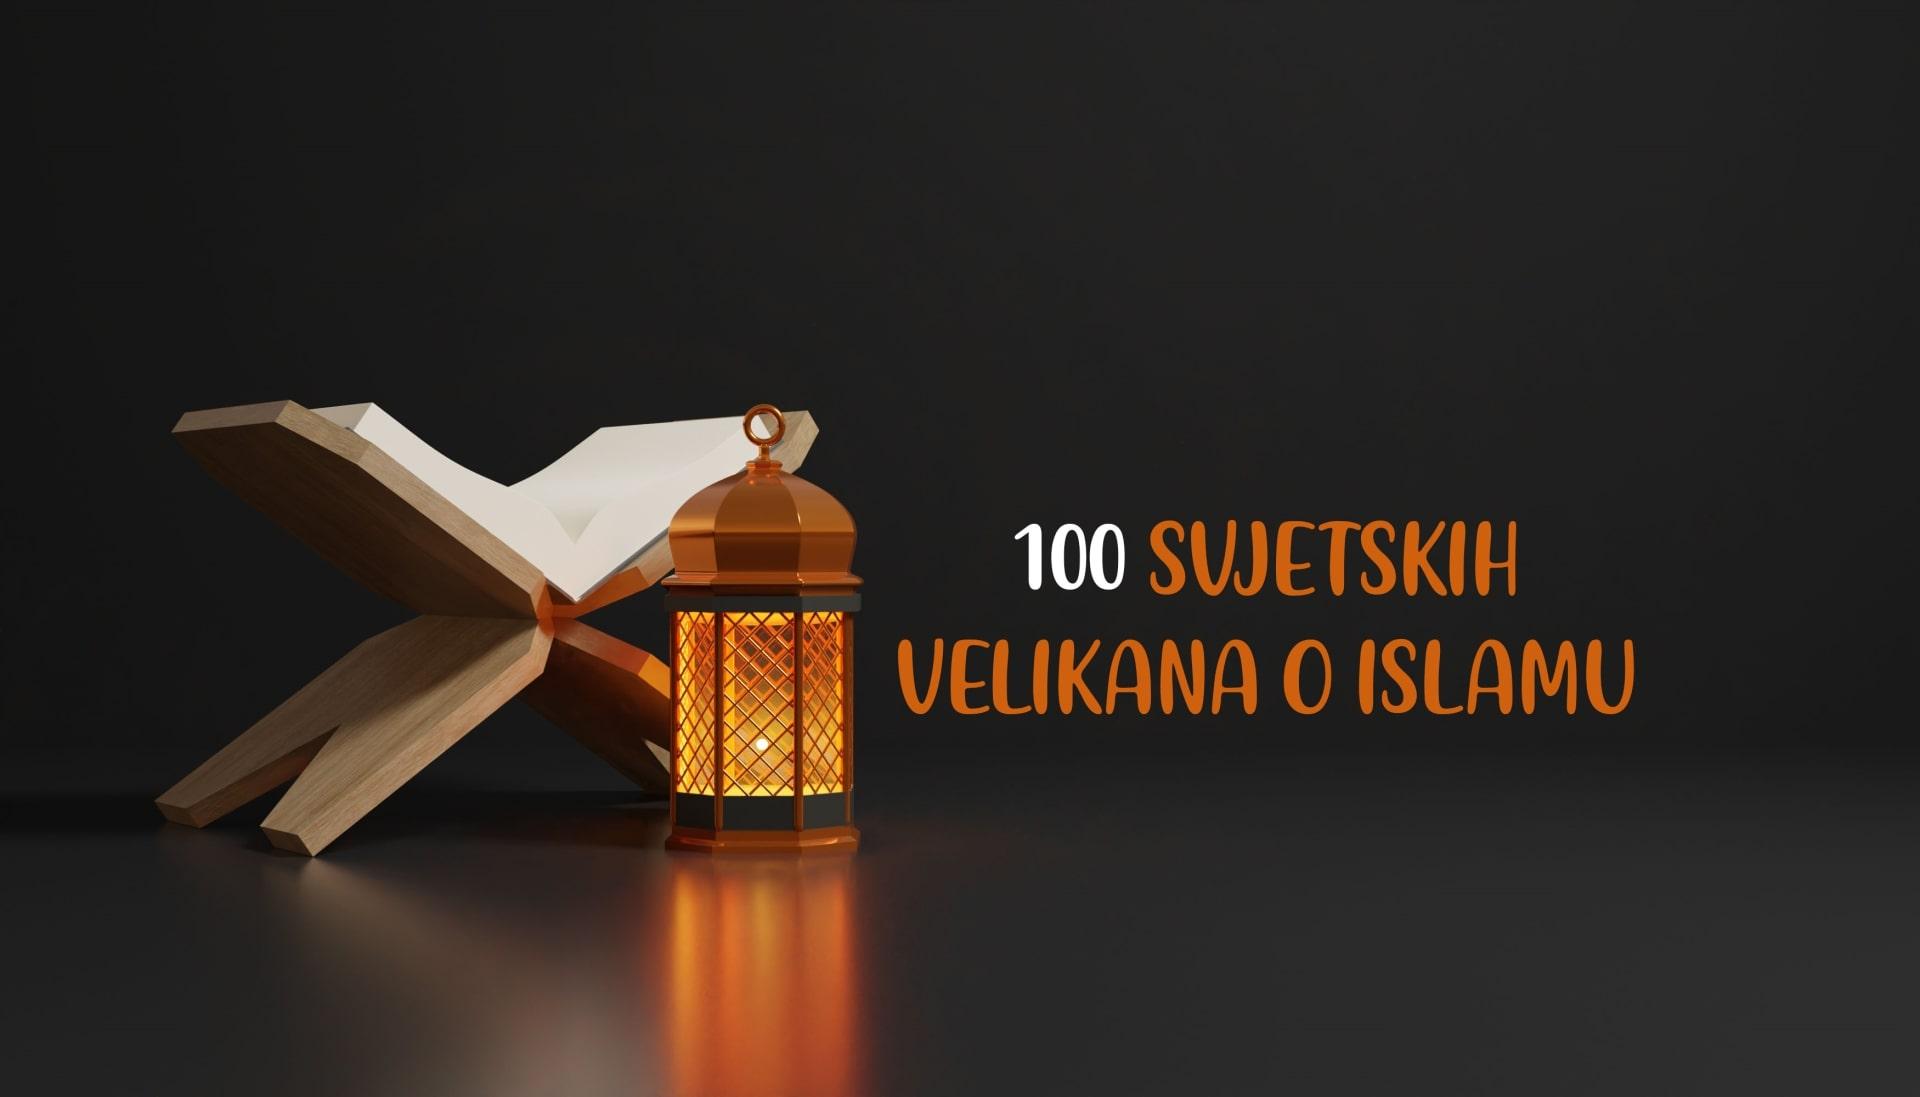 100 svjetskih velikana o islamu – A.S. Puškin Poučne priče El-Kelimeh Islamska literatura Islamske knjige